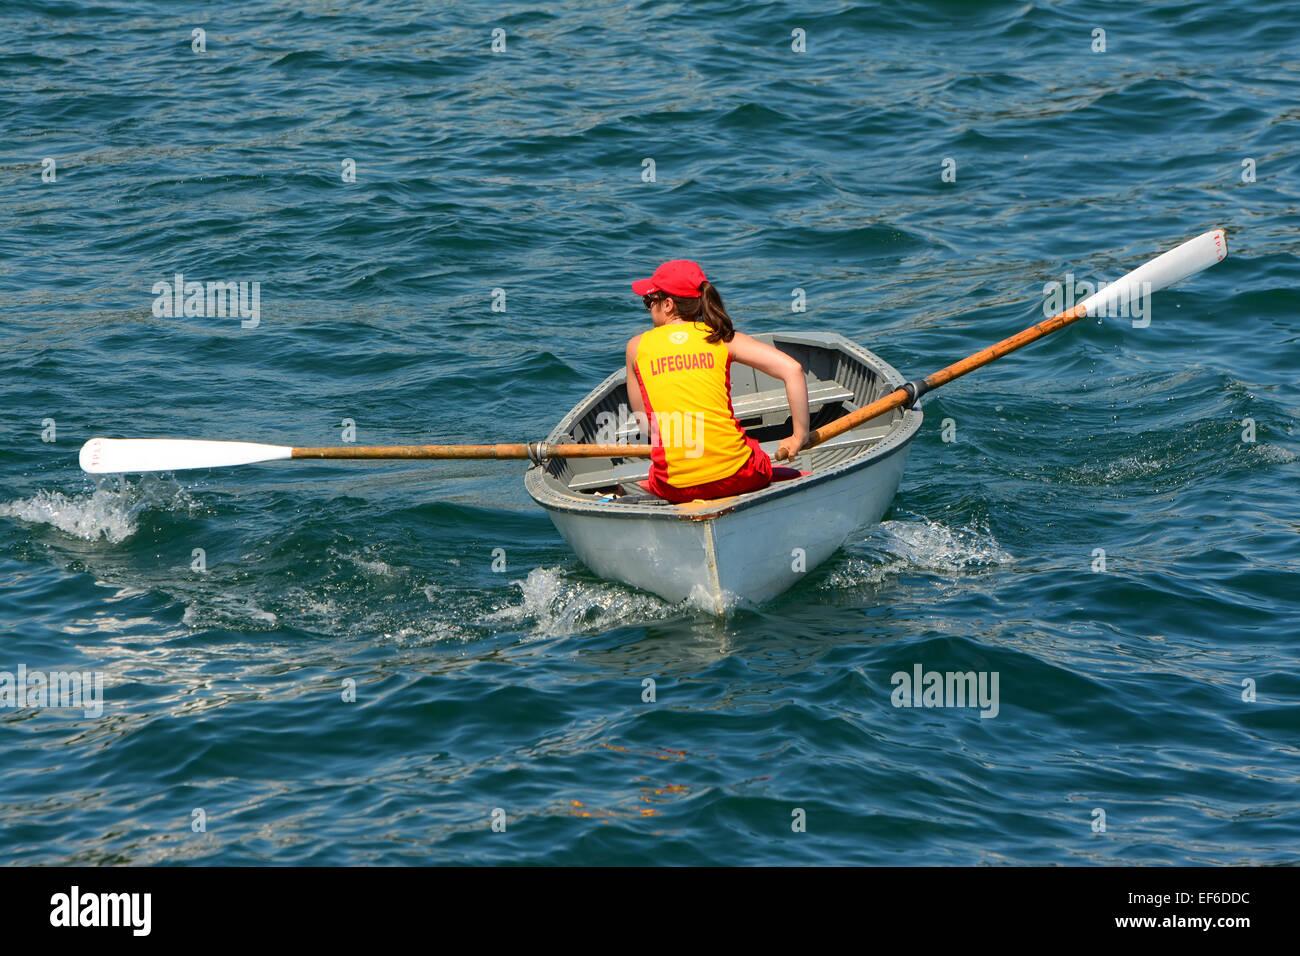 Lifeguard  rowboat - Stock Image